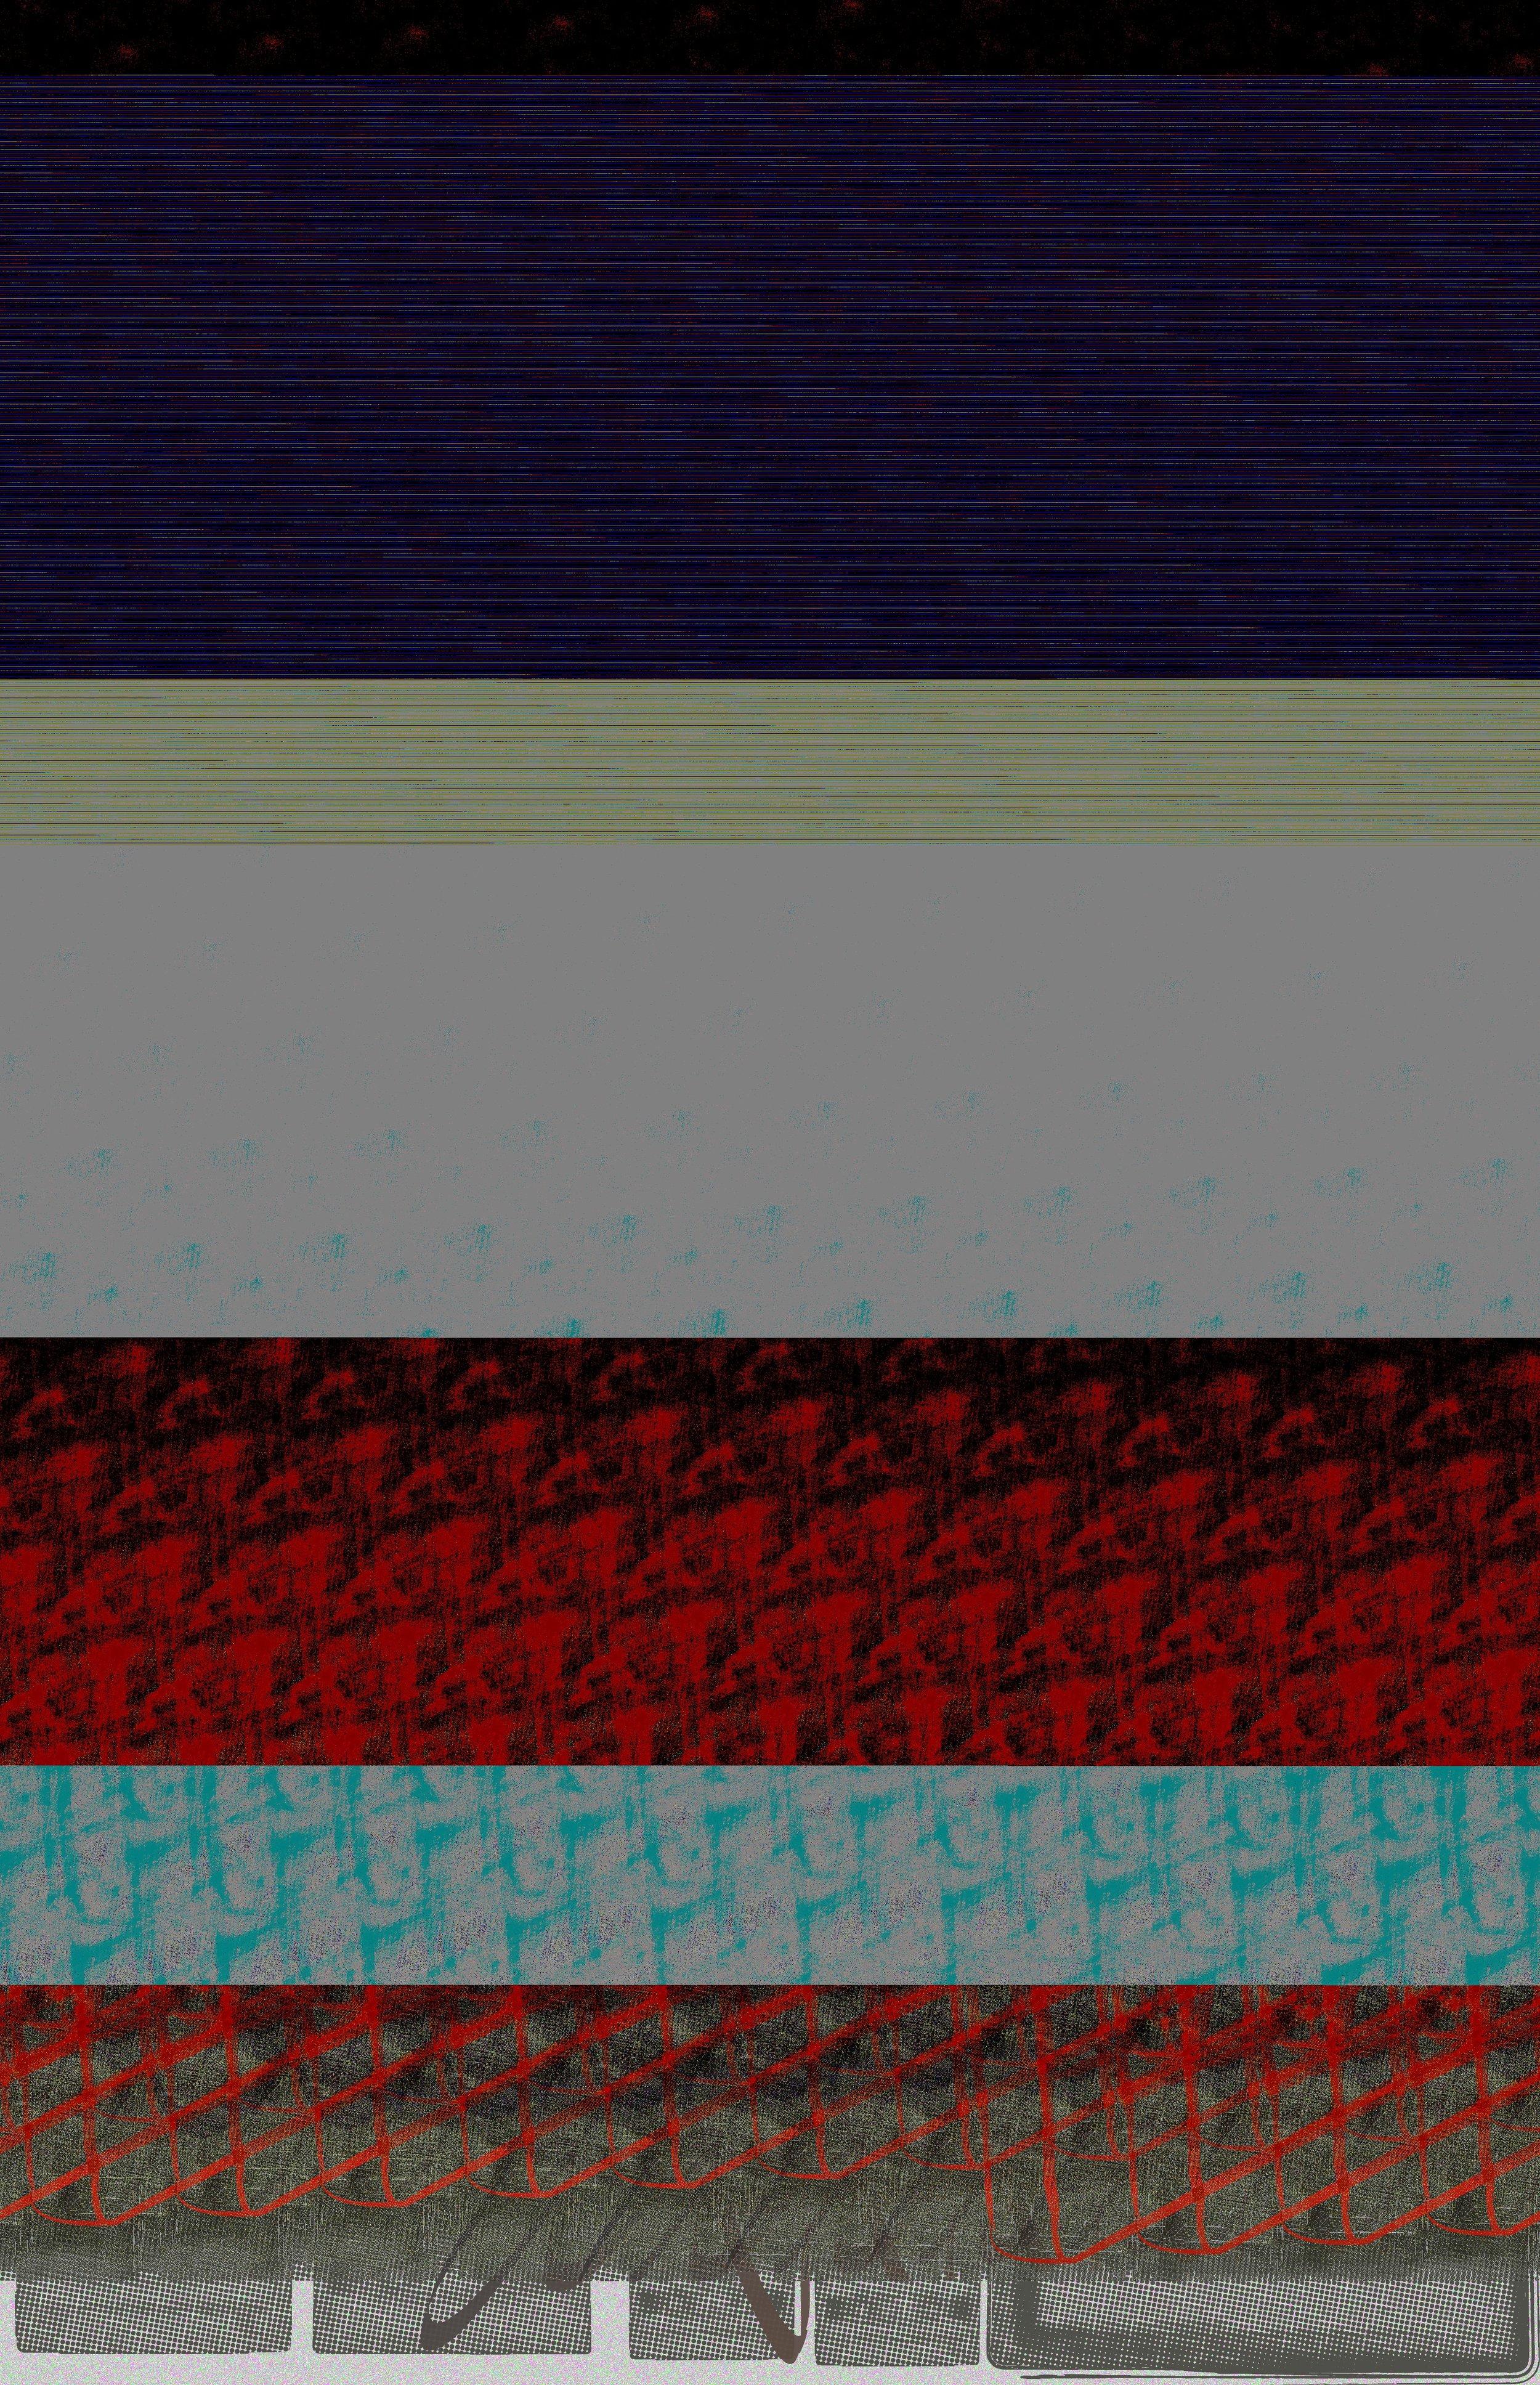 MS_03.jpg